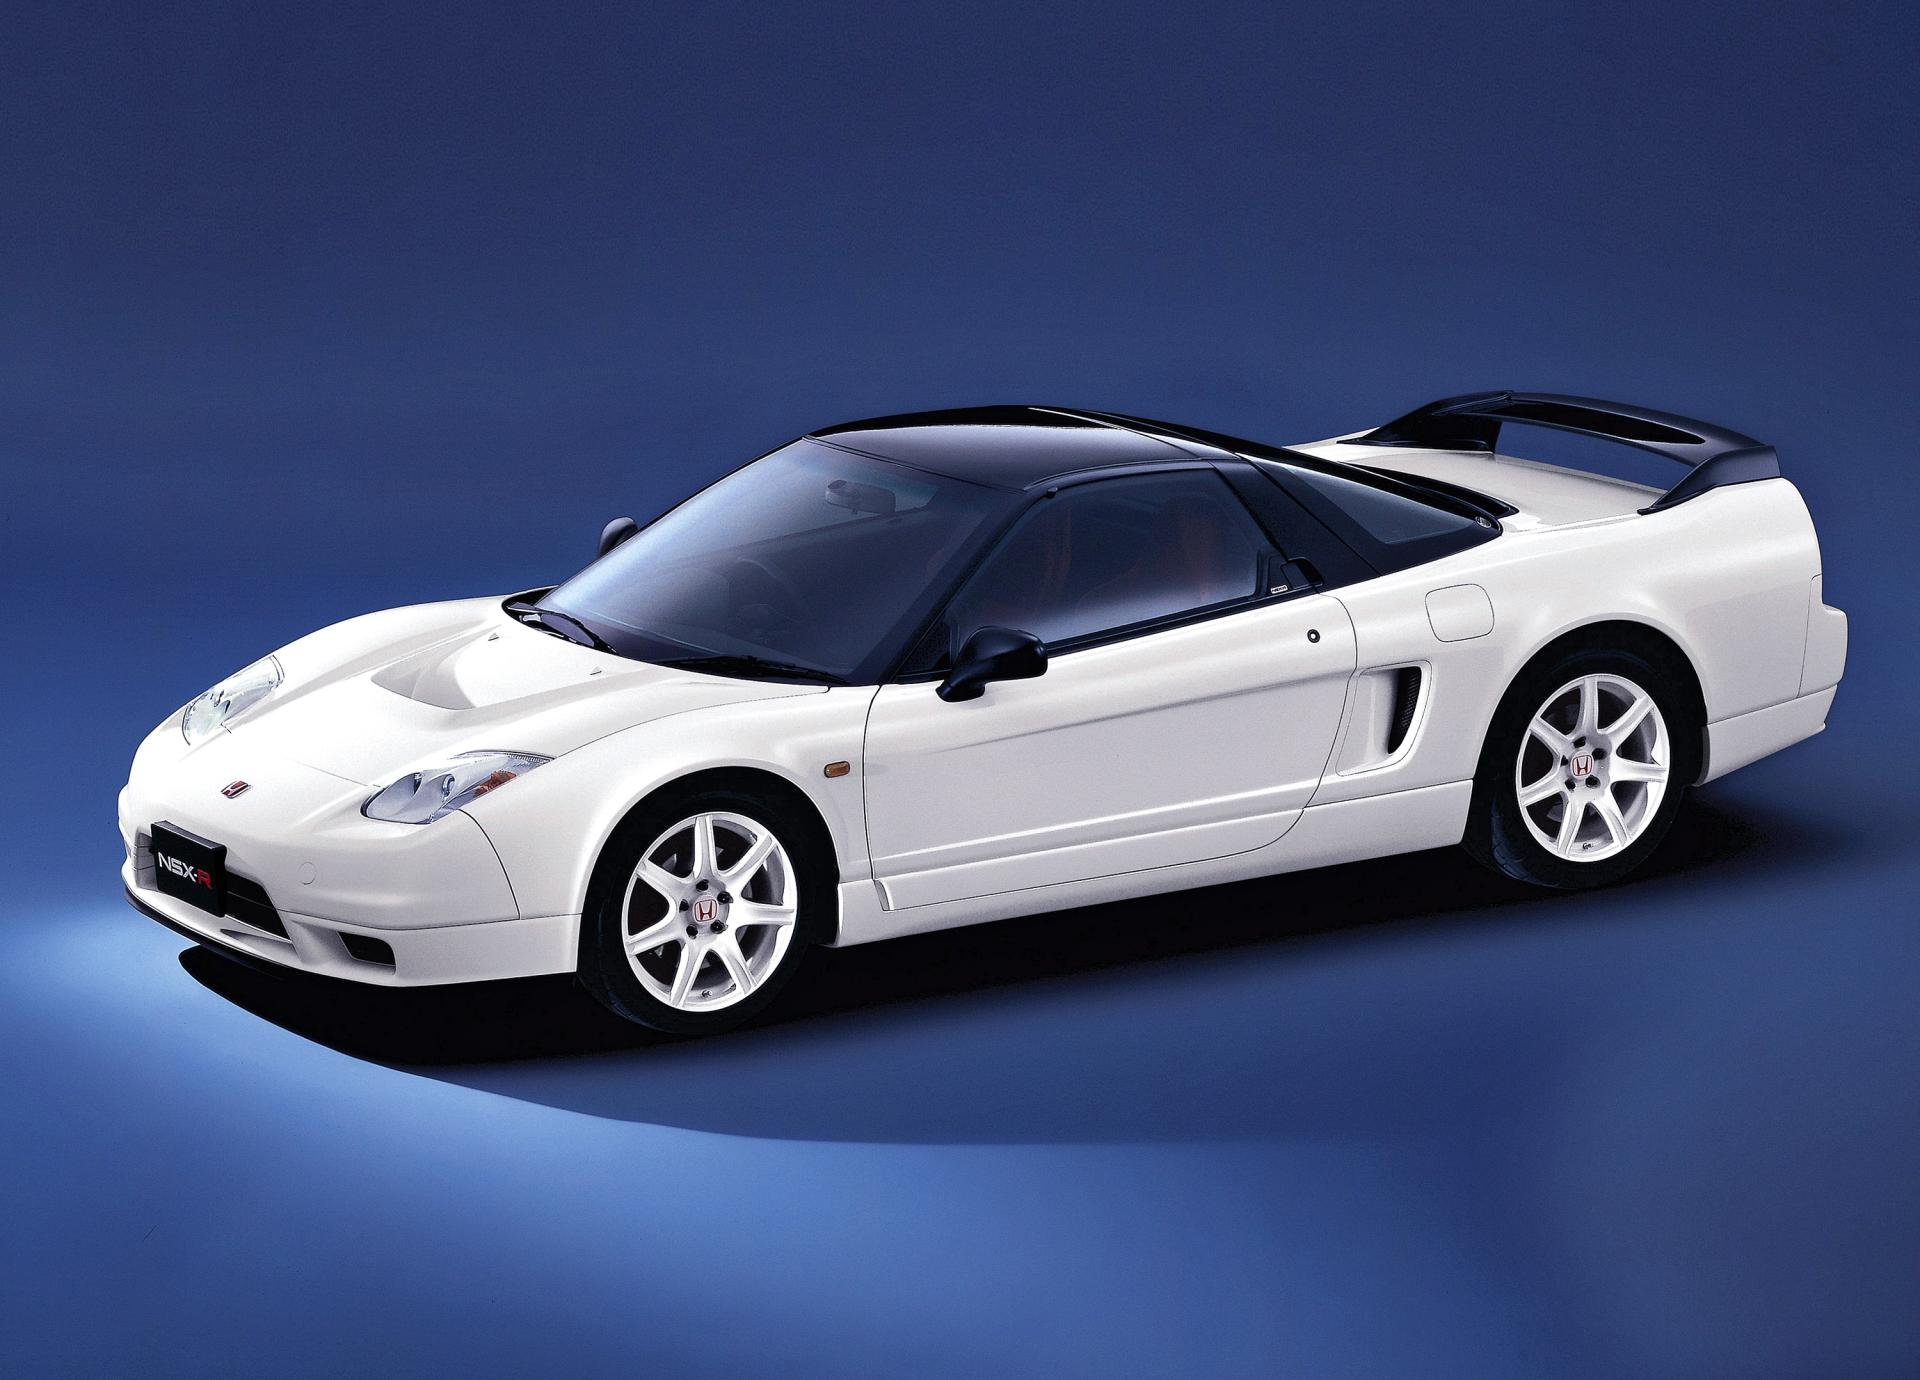 2005 Honda Nsx R Gt Image Https Www Conceptcarz Com